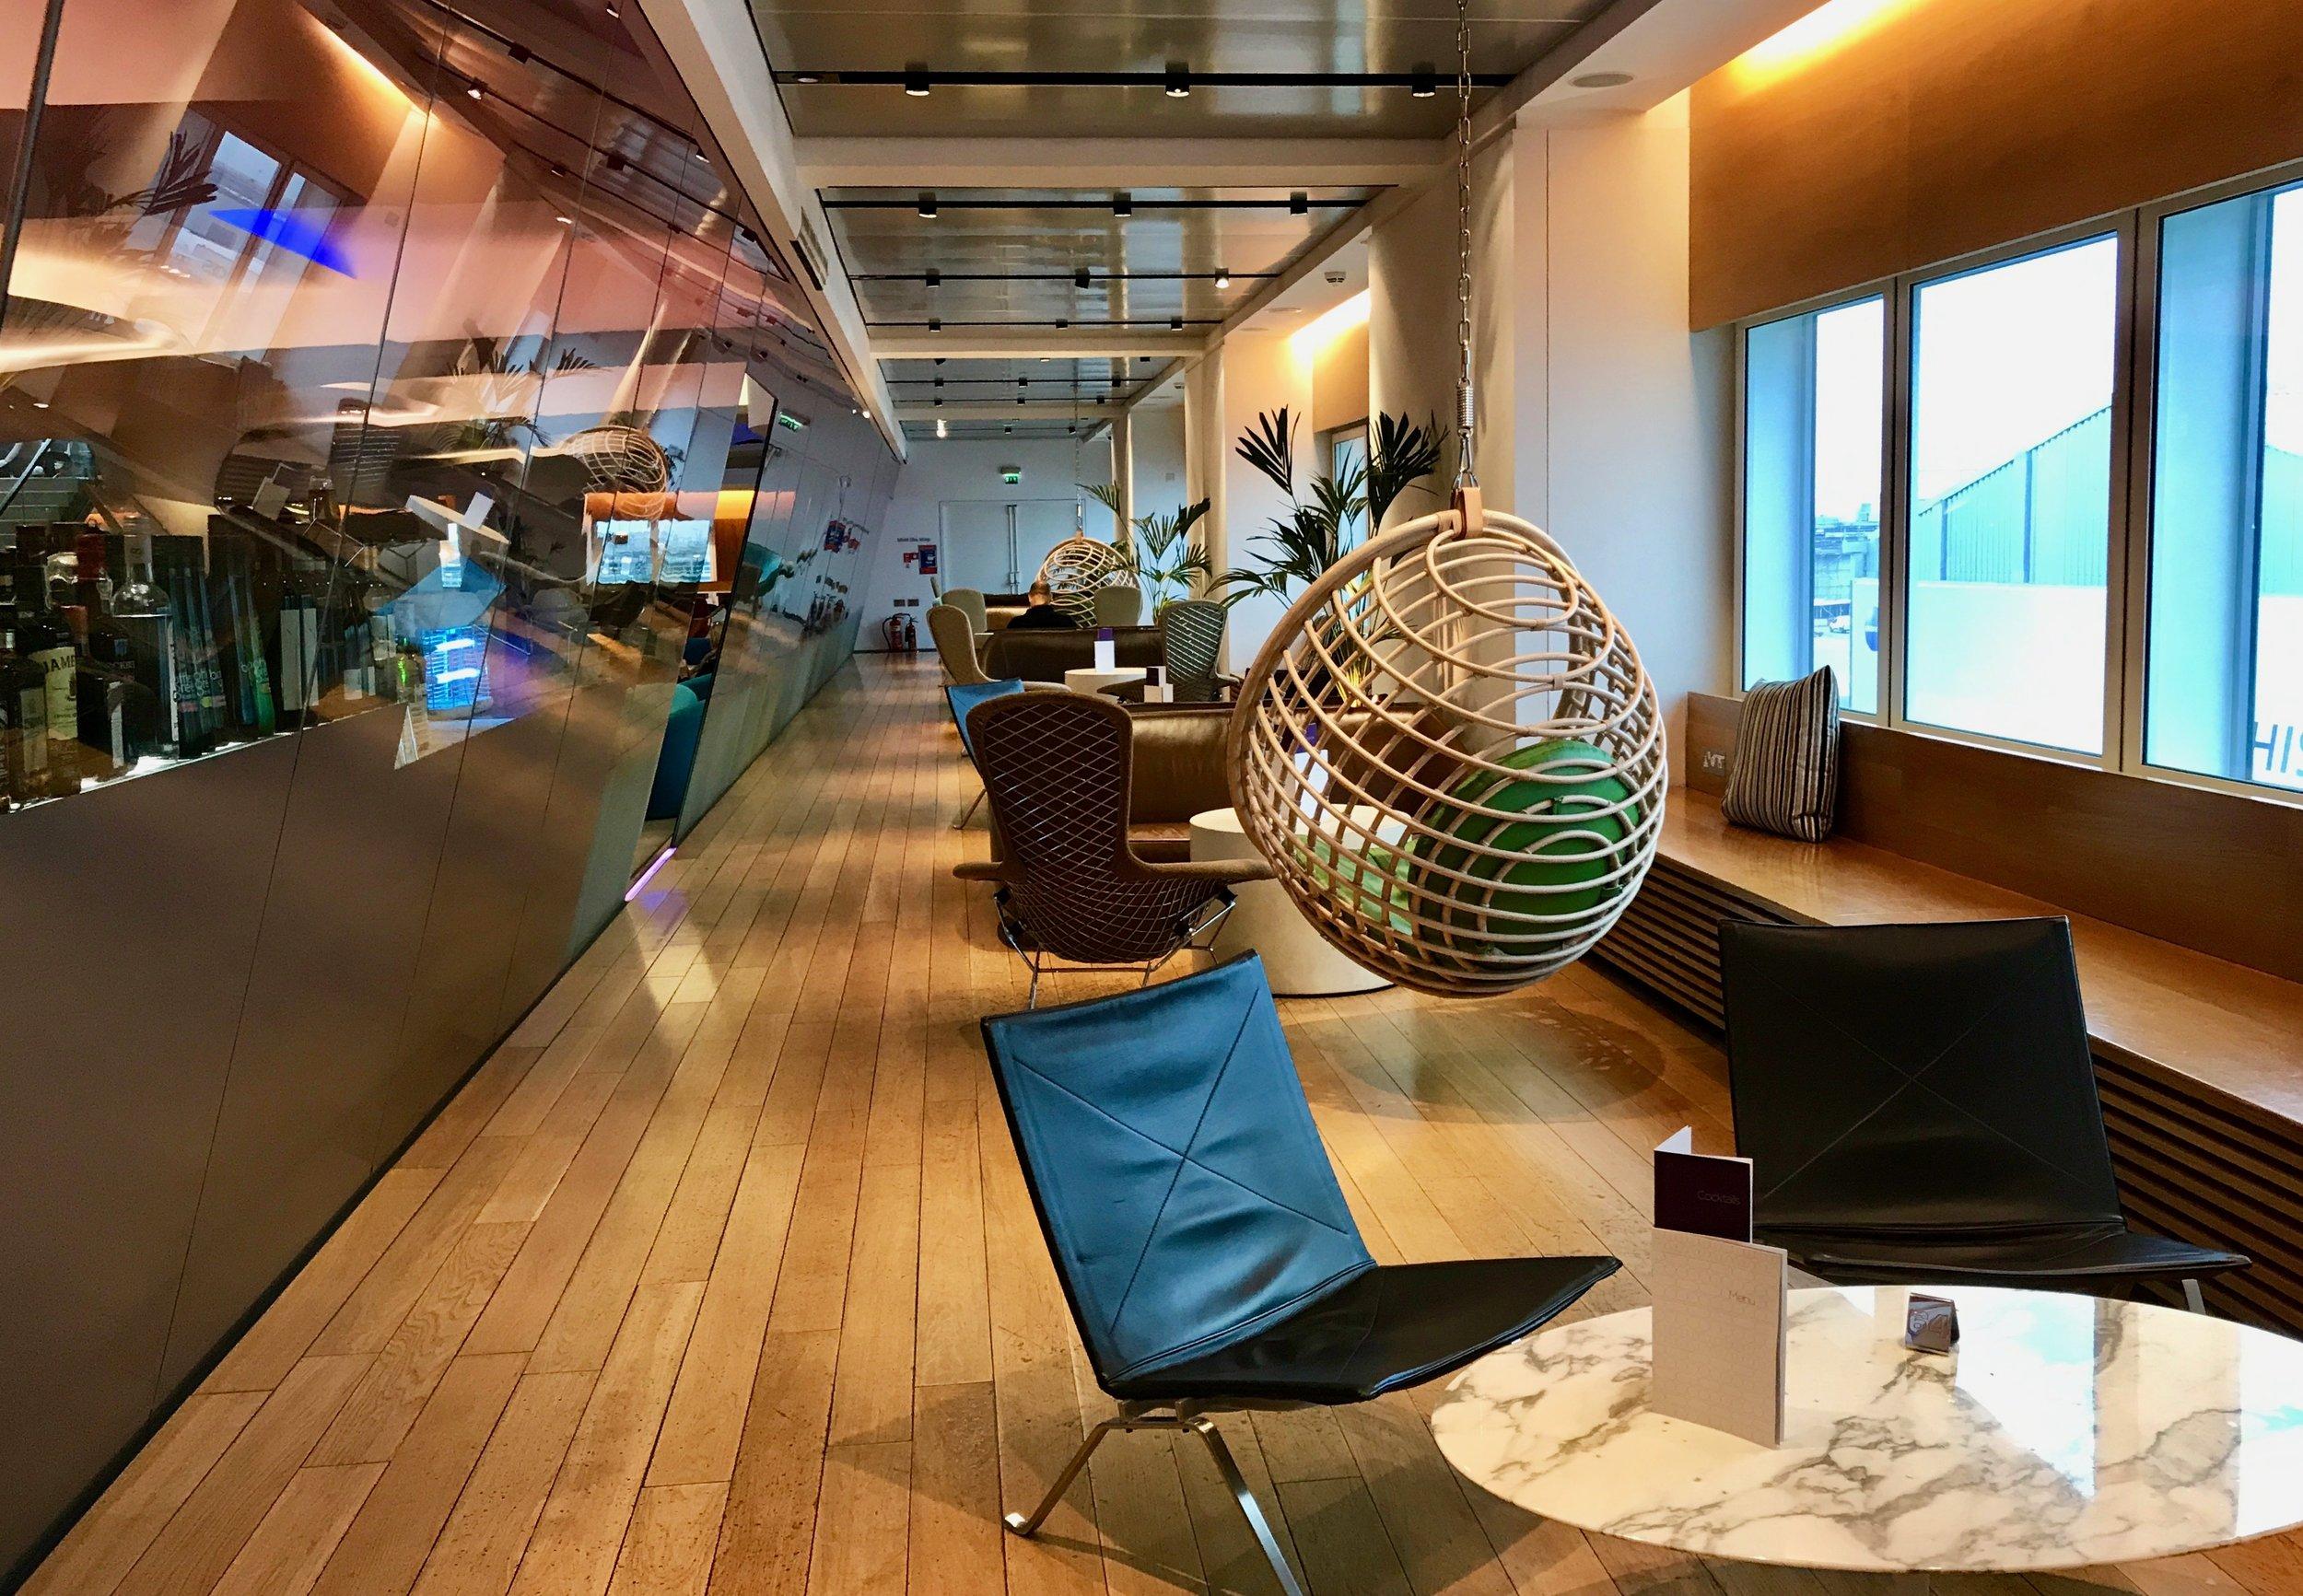 Virgin Atlantic Clubhouse Lounge London Heathrow LHR Airport - 19.jpg